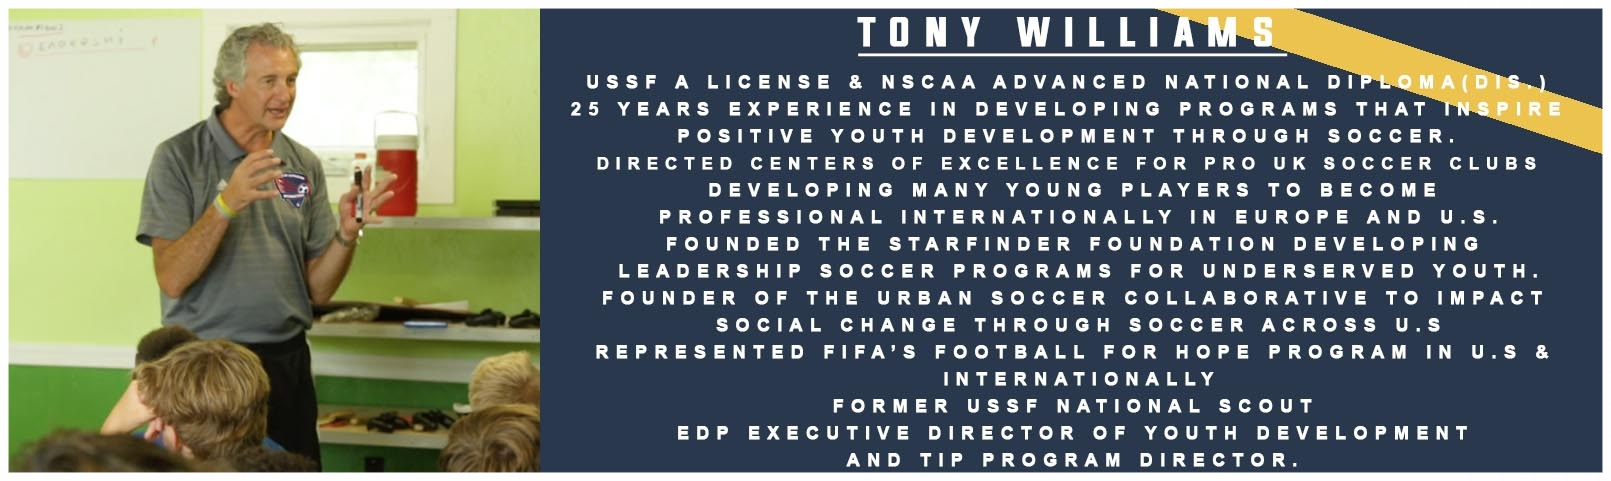 Tony Wiliams Biography.jpg